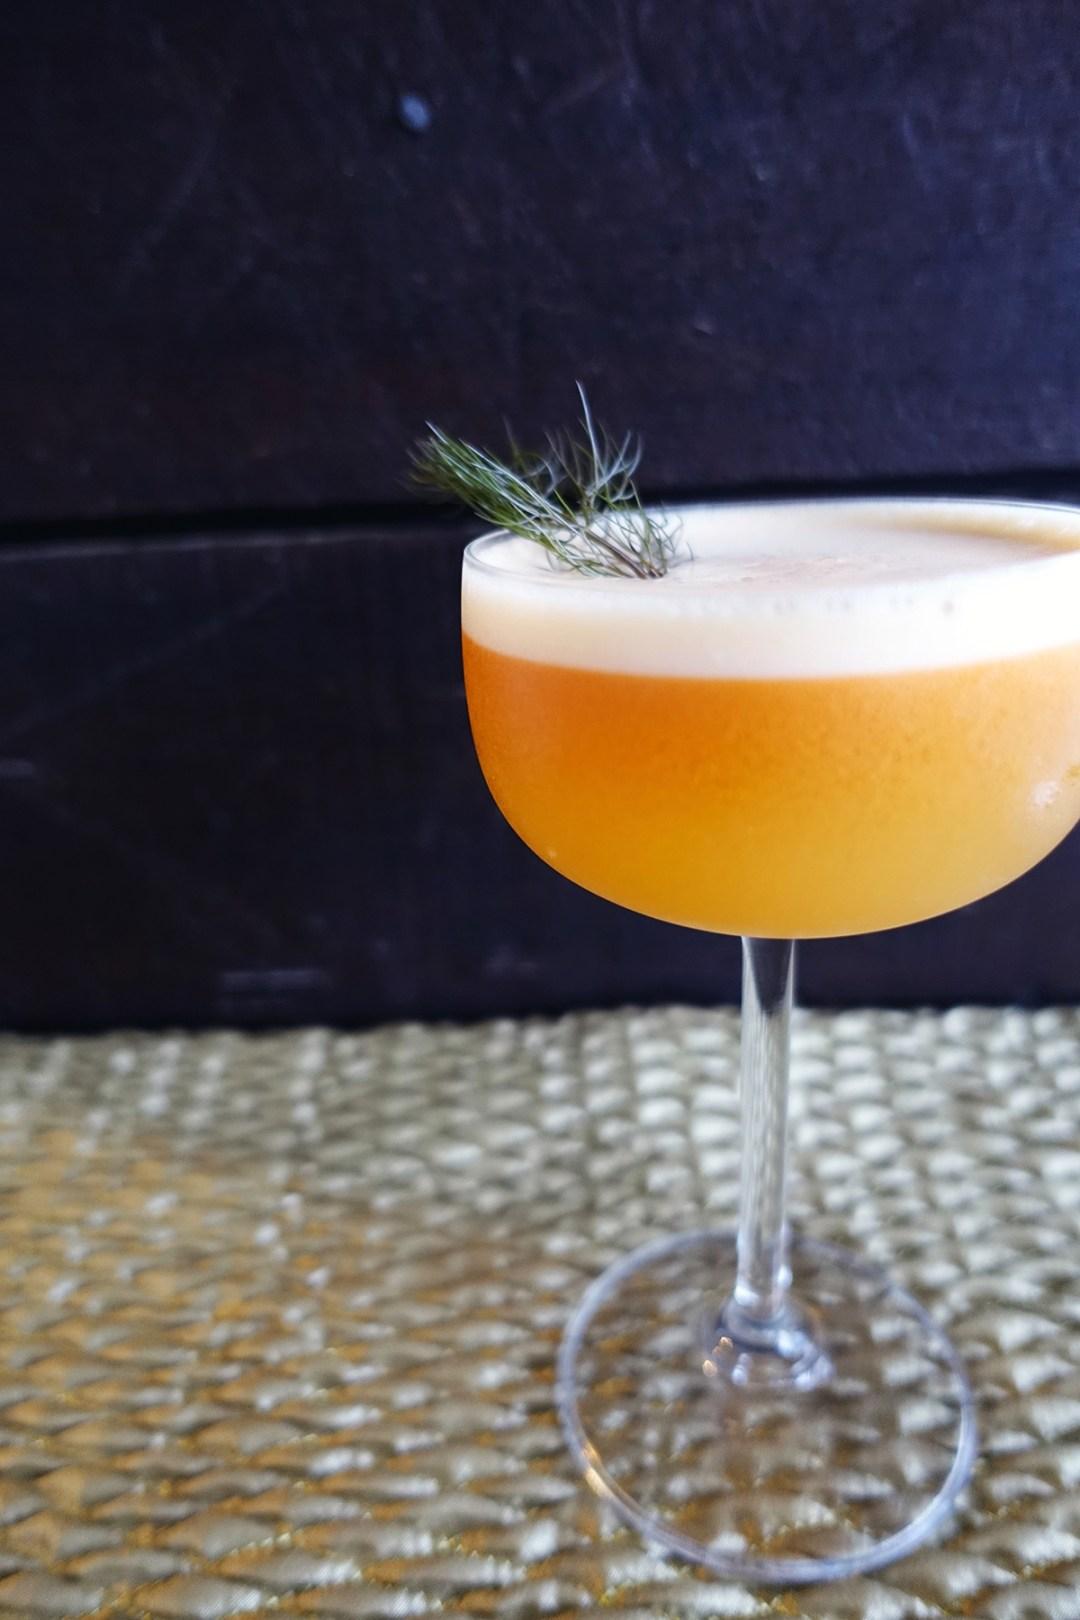 Spring Fever, cocktail recipe by rokz